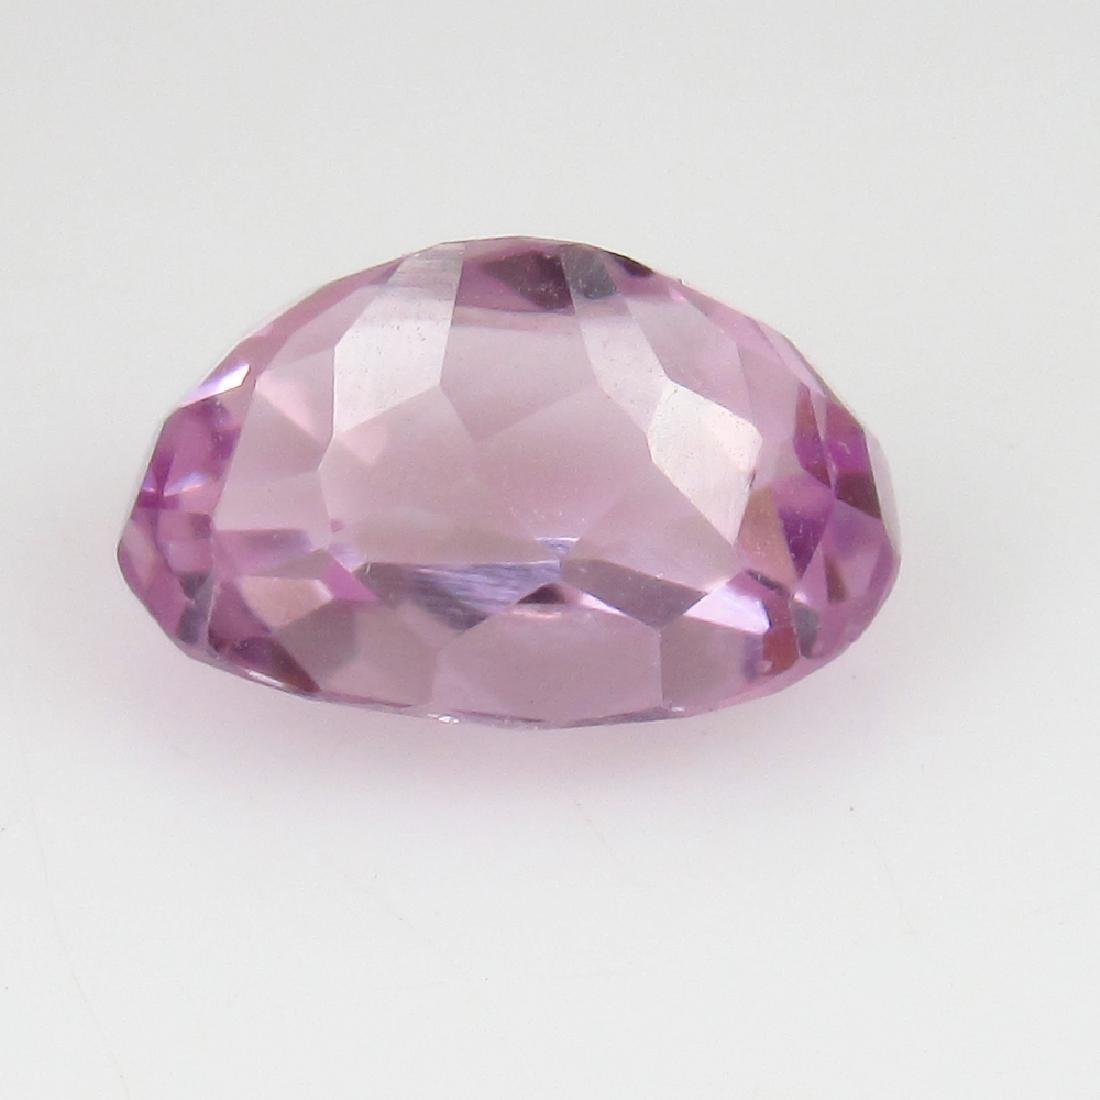 3.55 Ct IGI Certified Genuine Brazil Pink Spodumene - 6